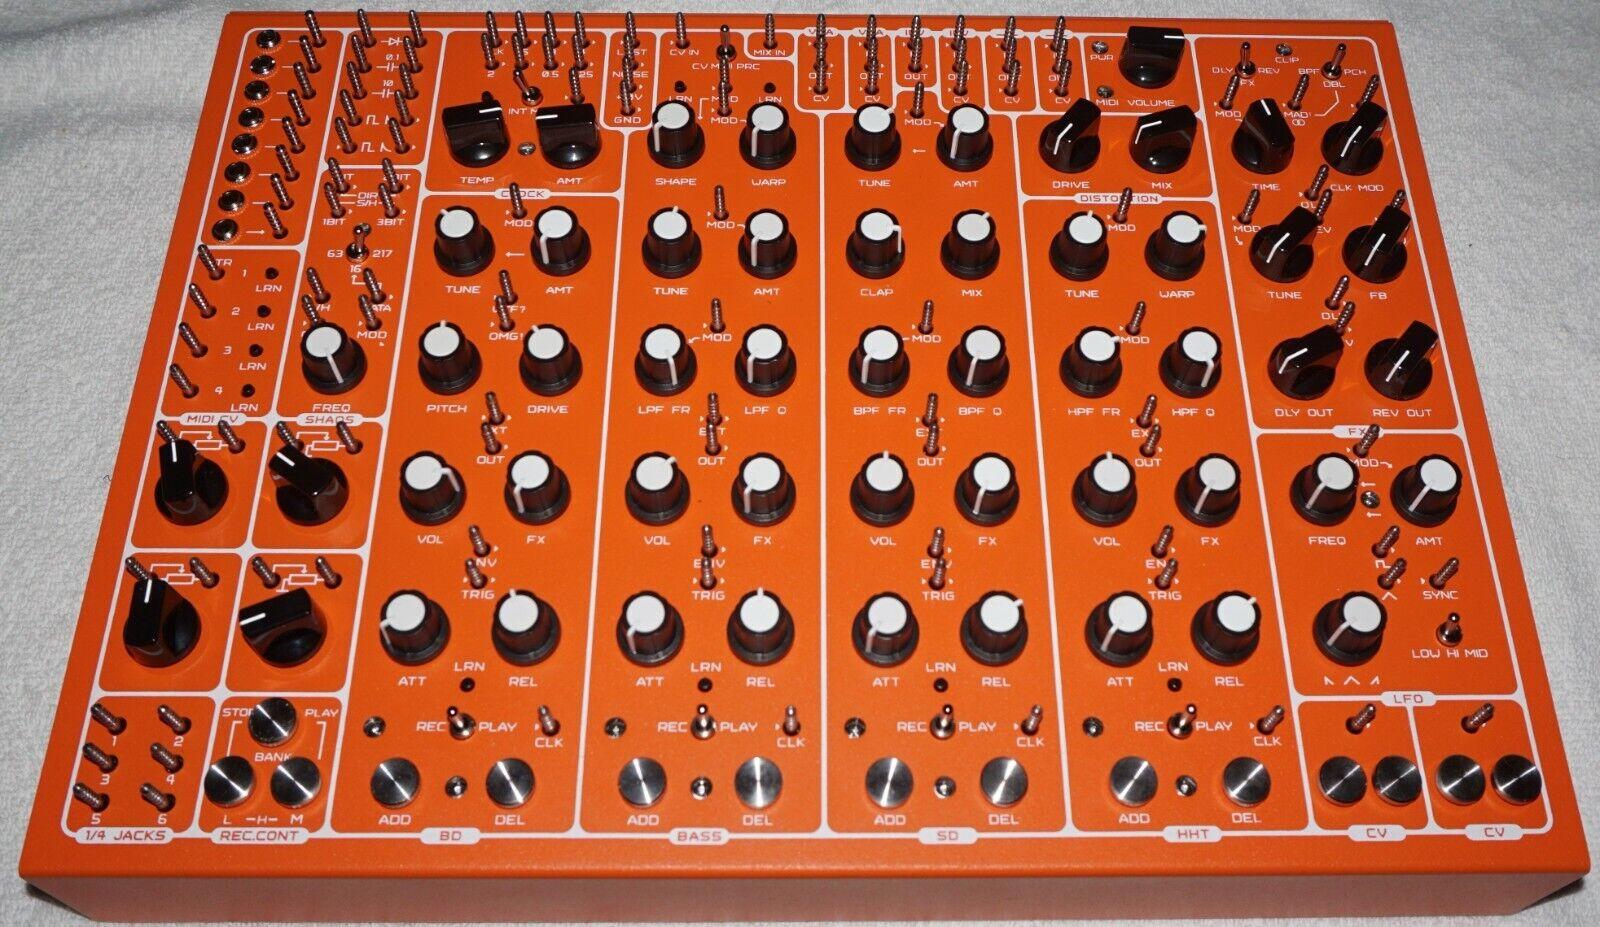 Soma Laboratory Pulsar-23 Orange Modular Analog Orgasmic Drum Machine NEW - $2,100.00